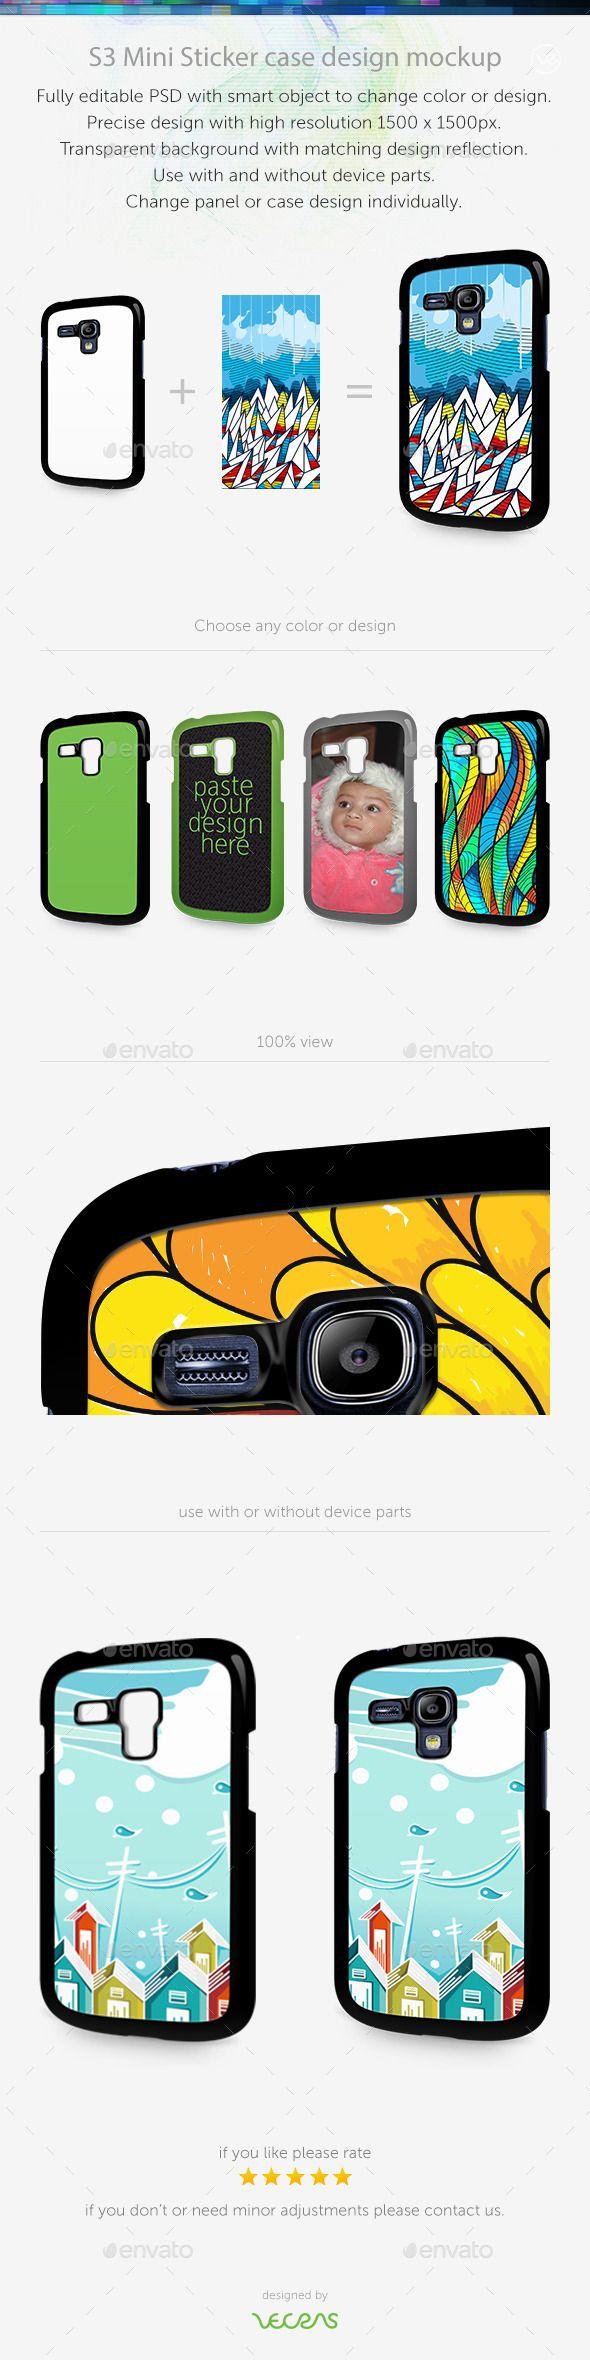 S3 Mini Sticker Case Design Mockup — Photoshop PSD #mobile #digital print • Available here → https://graphicriver.net/item/s3-mini-sticker-case-design-mockup/10449370?ref=pxcr